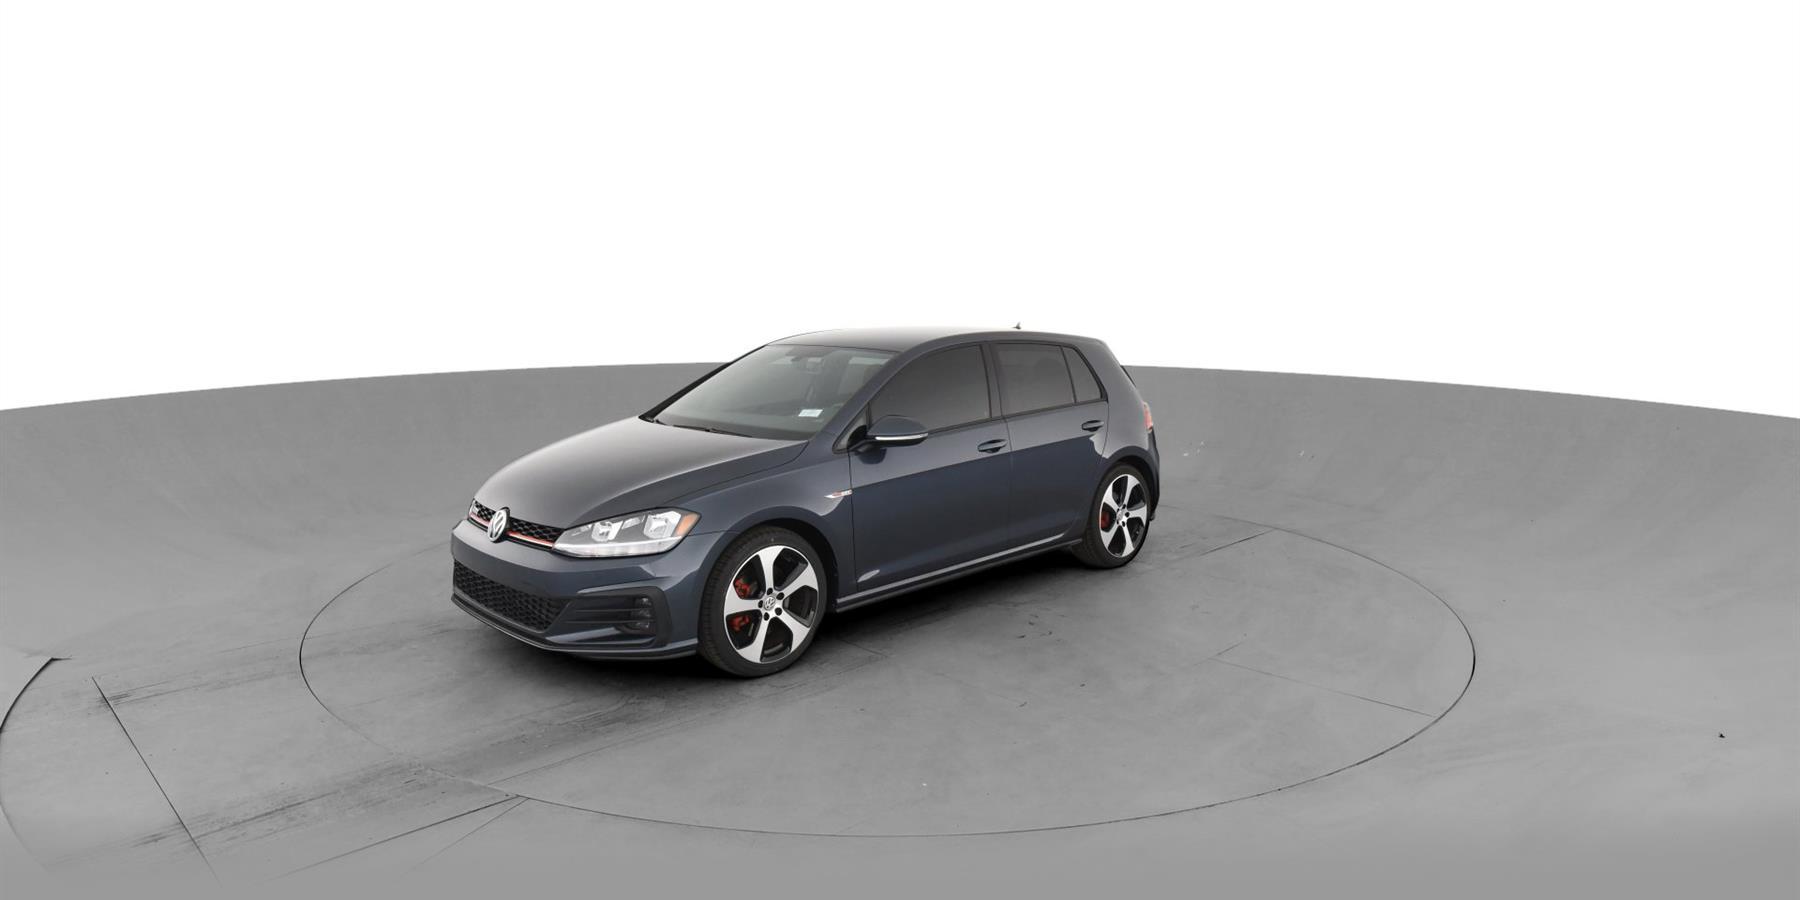 2018 Volkswagen Golf GTI S Hatchback Sedan 4D for Sale